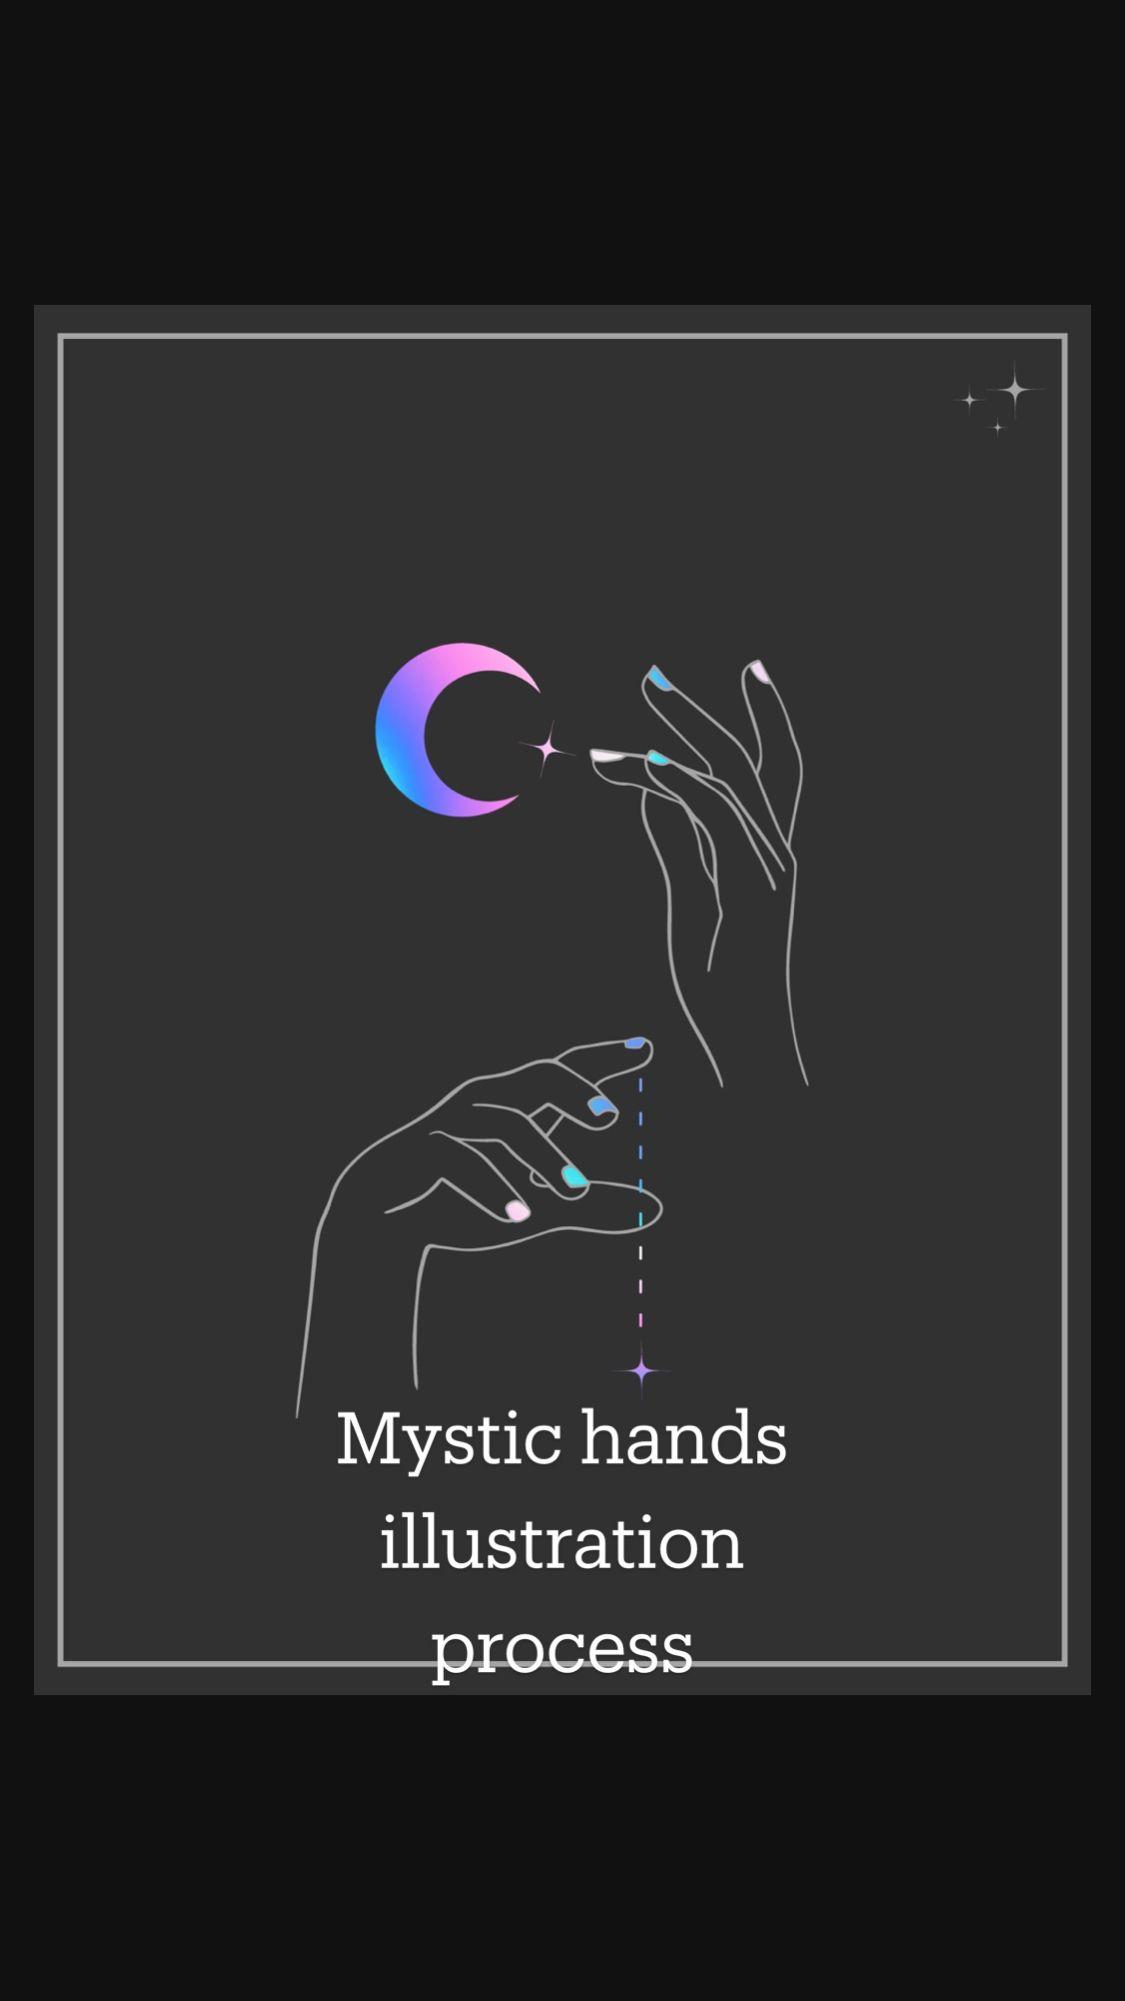 Mystic hands illustration process